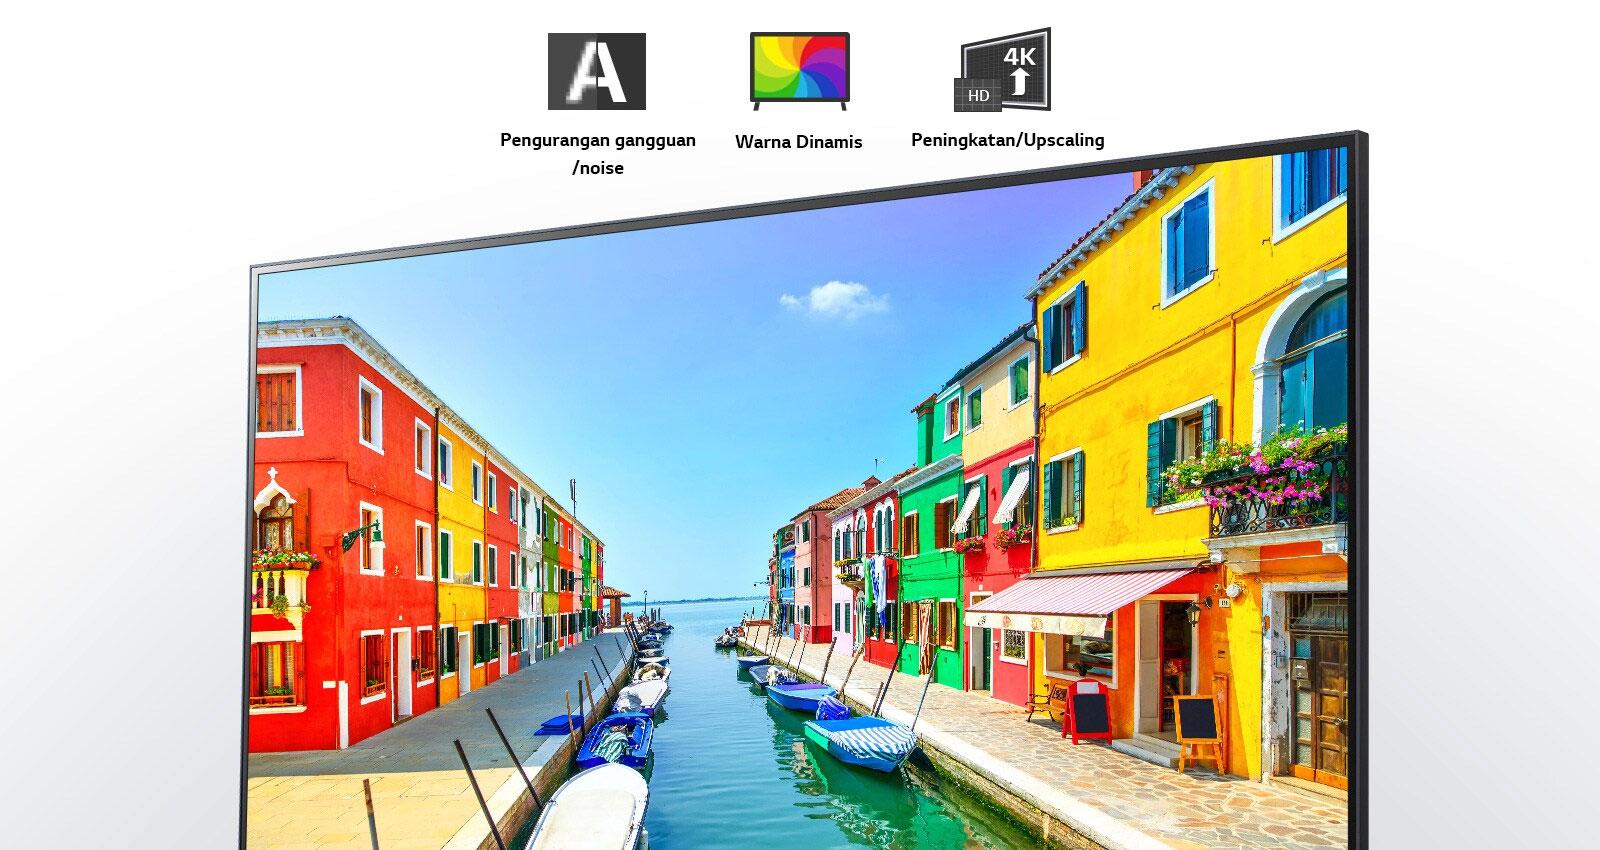 Layar TV menayangkan gambar kota pelabuhan dengan berbagai bangunan warna-warni dan beberapa perahu bersandar pada pelabuhan yang tampak memanjang